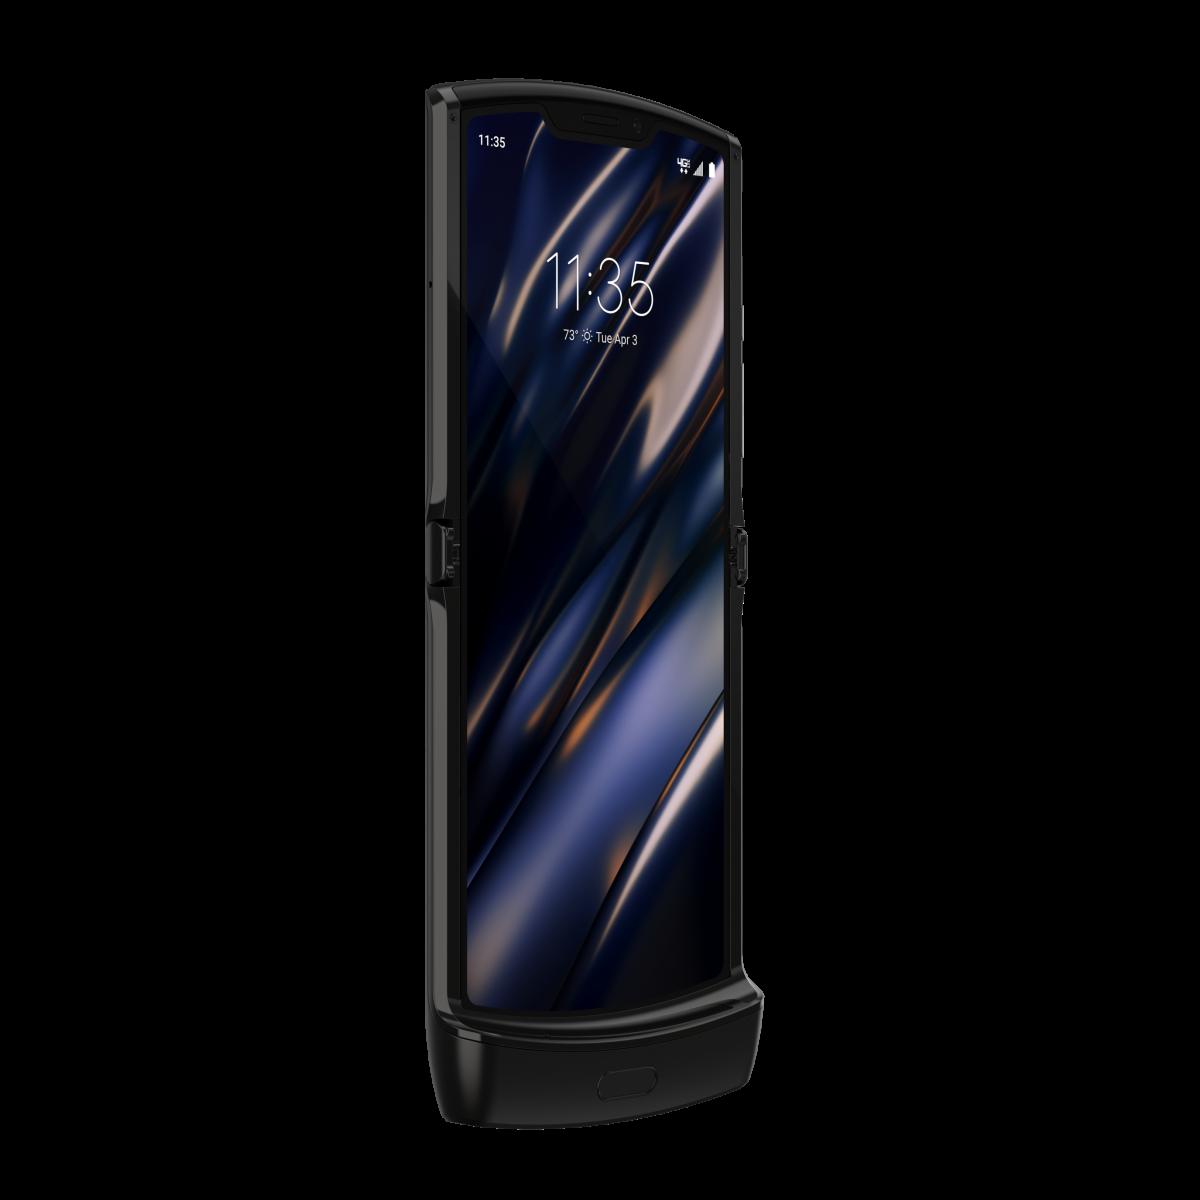 Представлена раскладушка с гибким экраном Motorola Razr